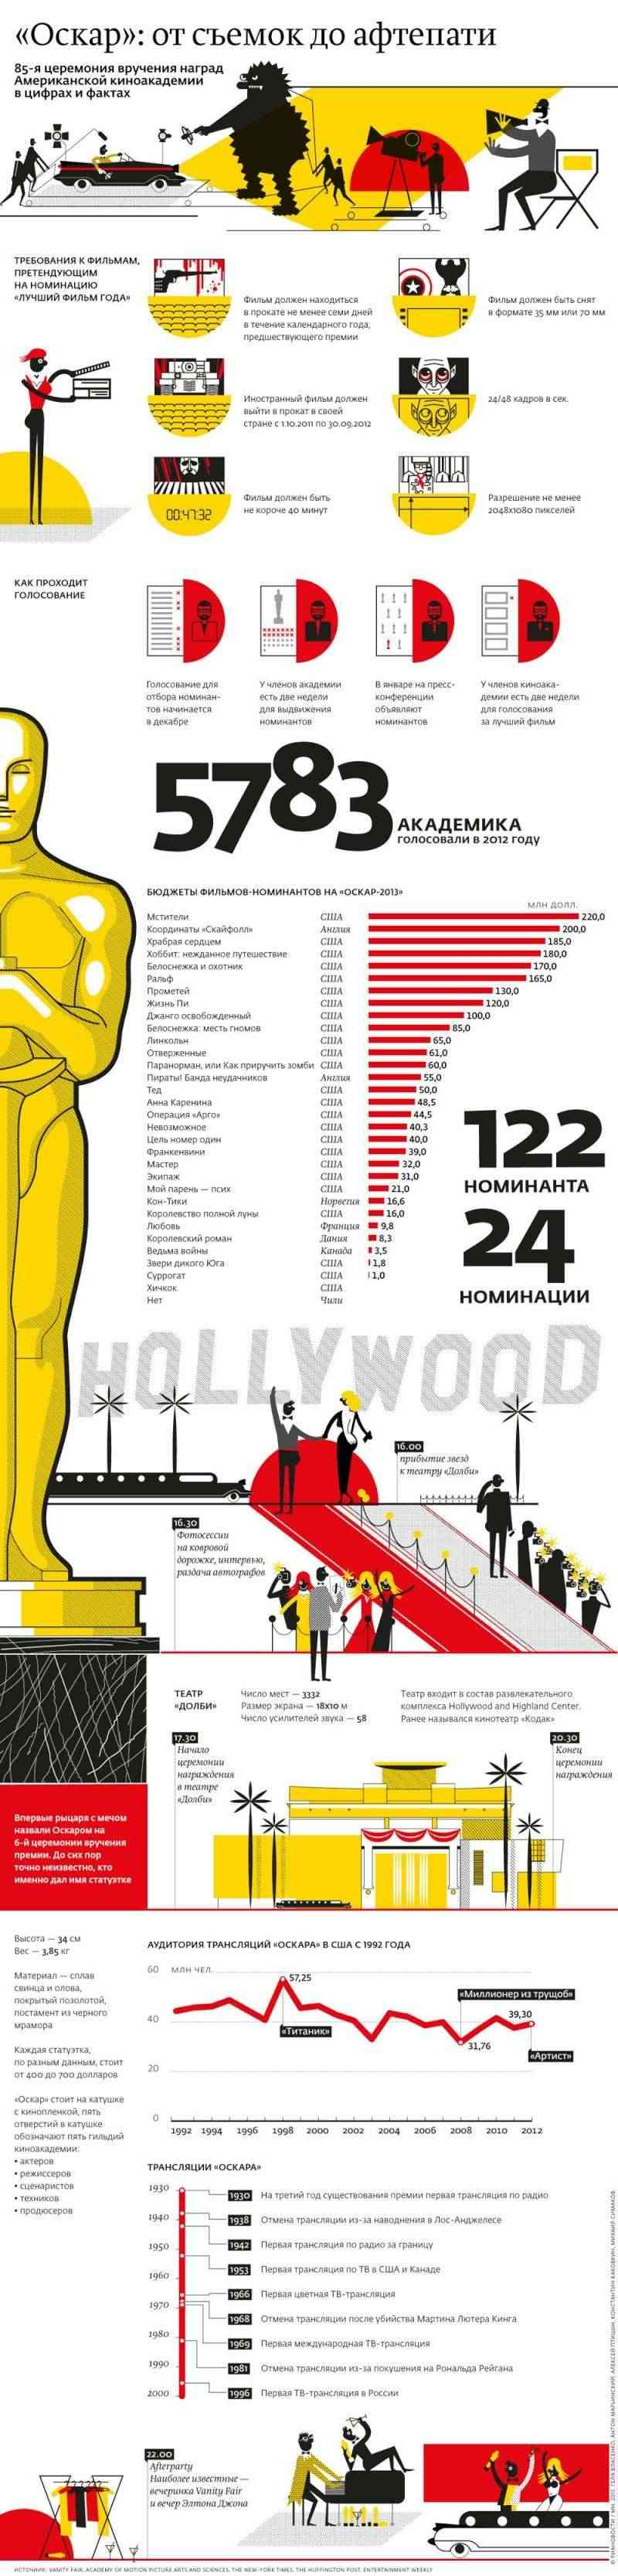 Tomorrow is Oscars!!! - Page 4 33806210